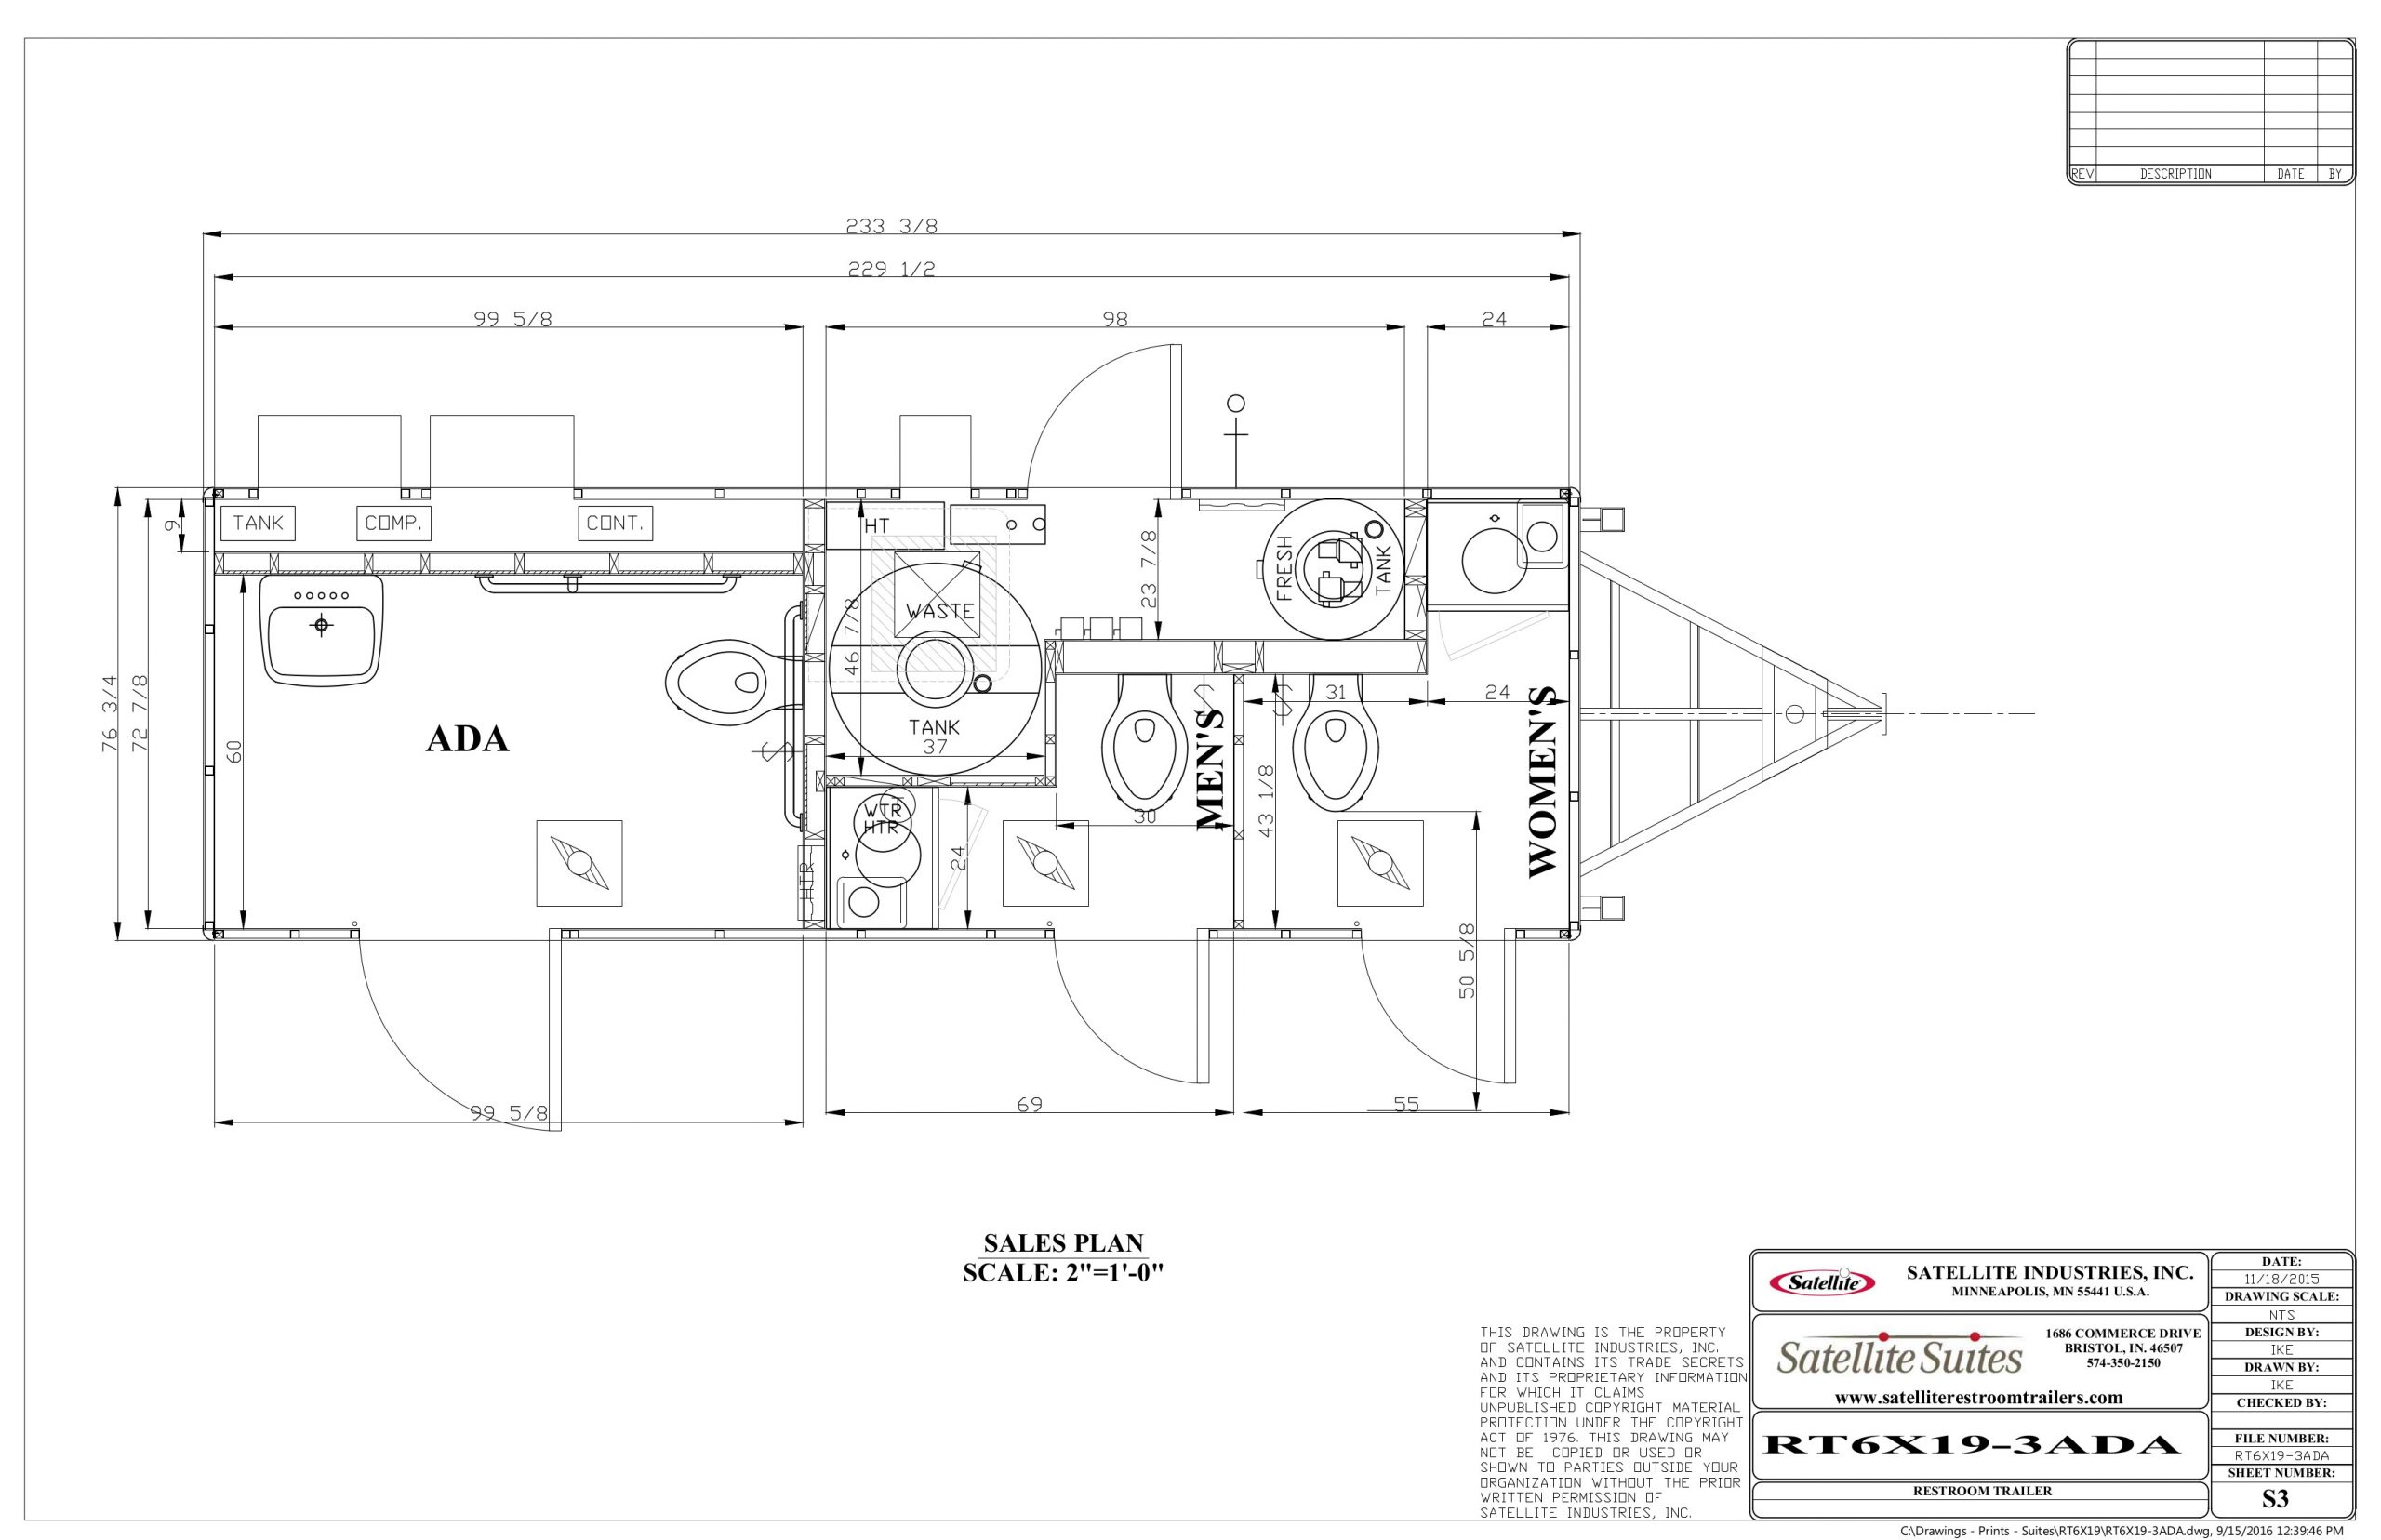 2-Stall ADA Restroom Trailers - 19' | Anderson Rentals, Inc.